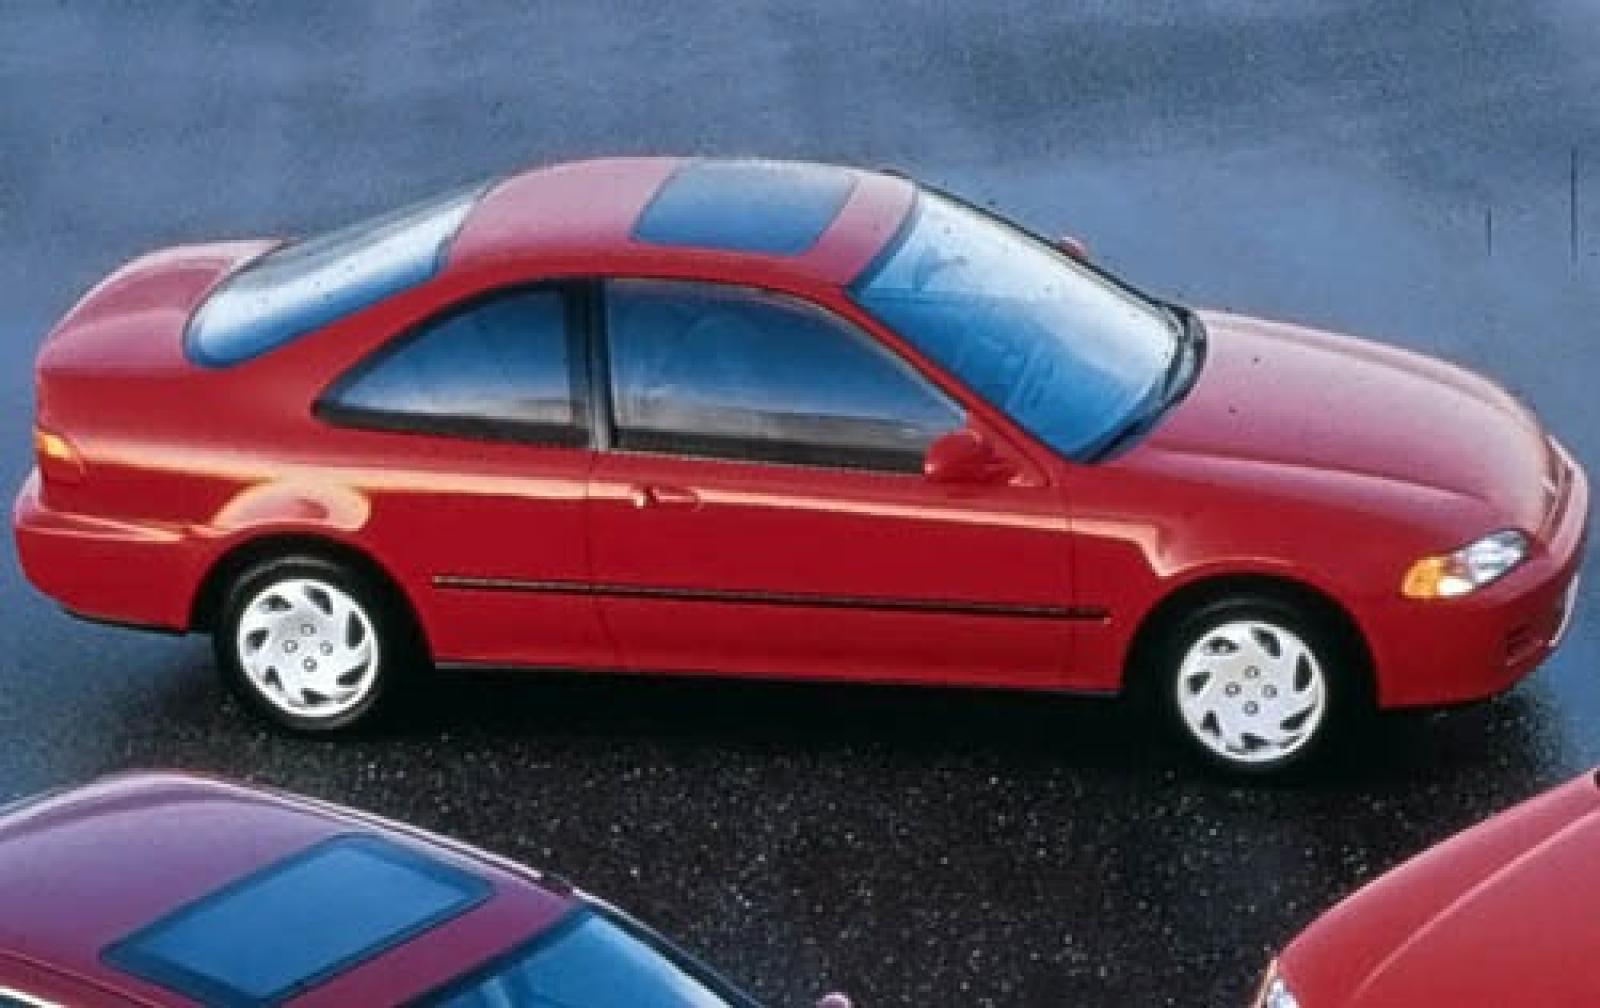 1995 honda civic information and photos zombiedrive for Honda hatchback ex